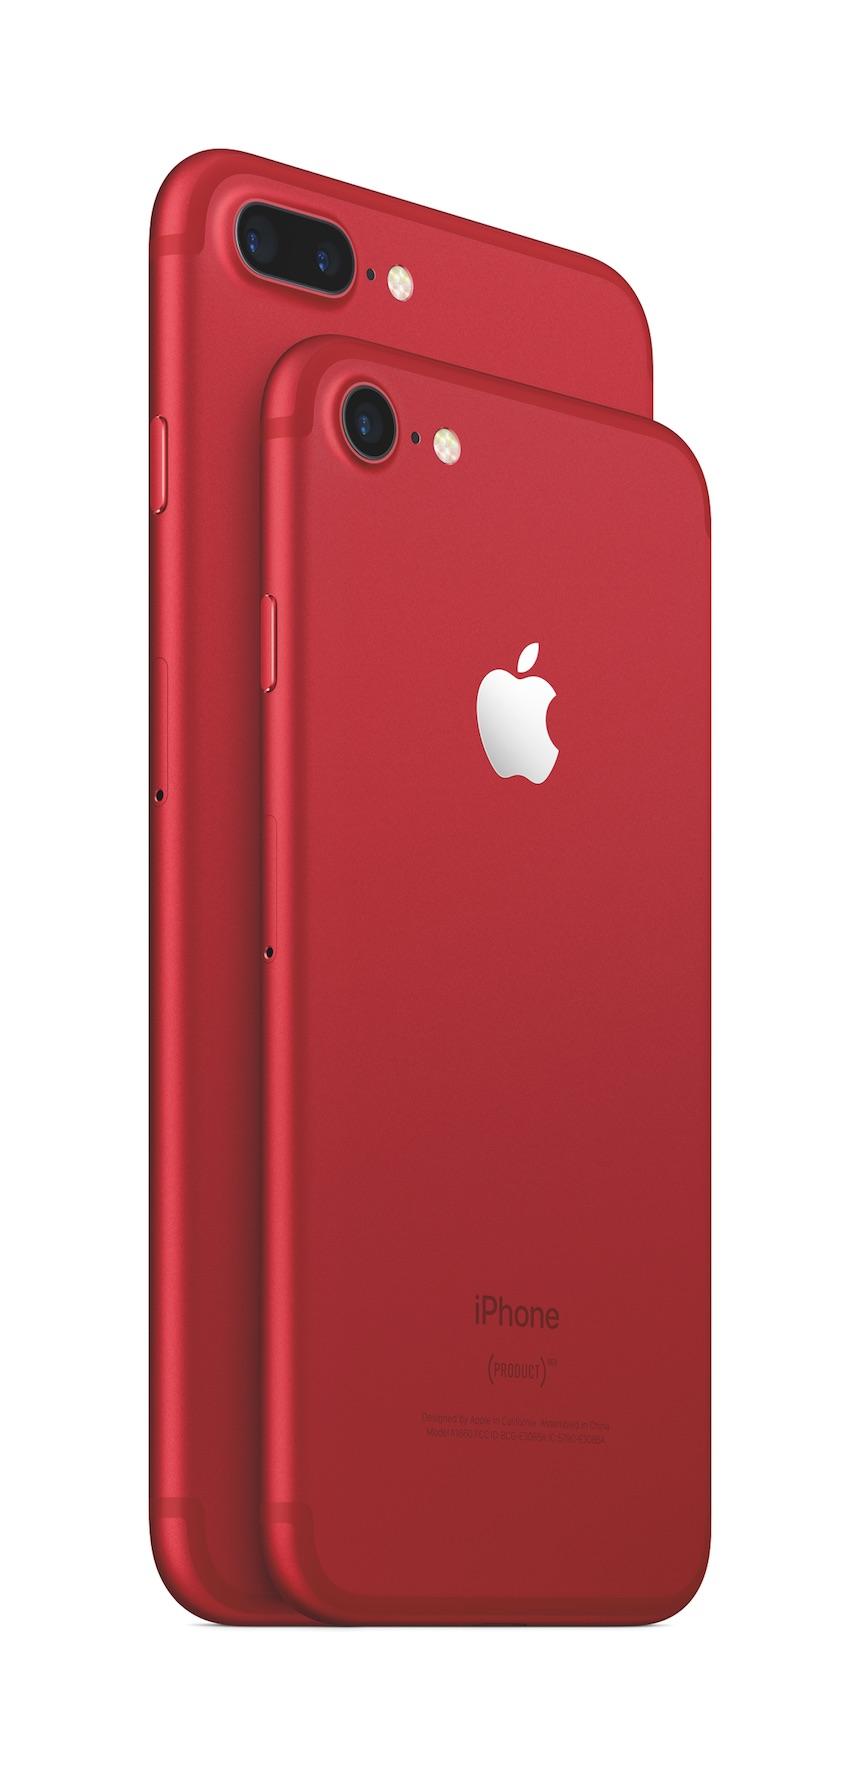 Apple silikonskal iphone 7 red